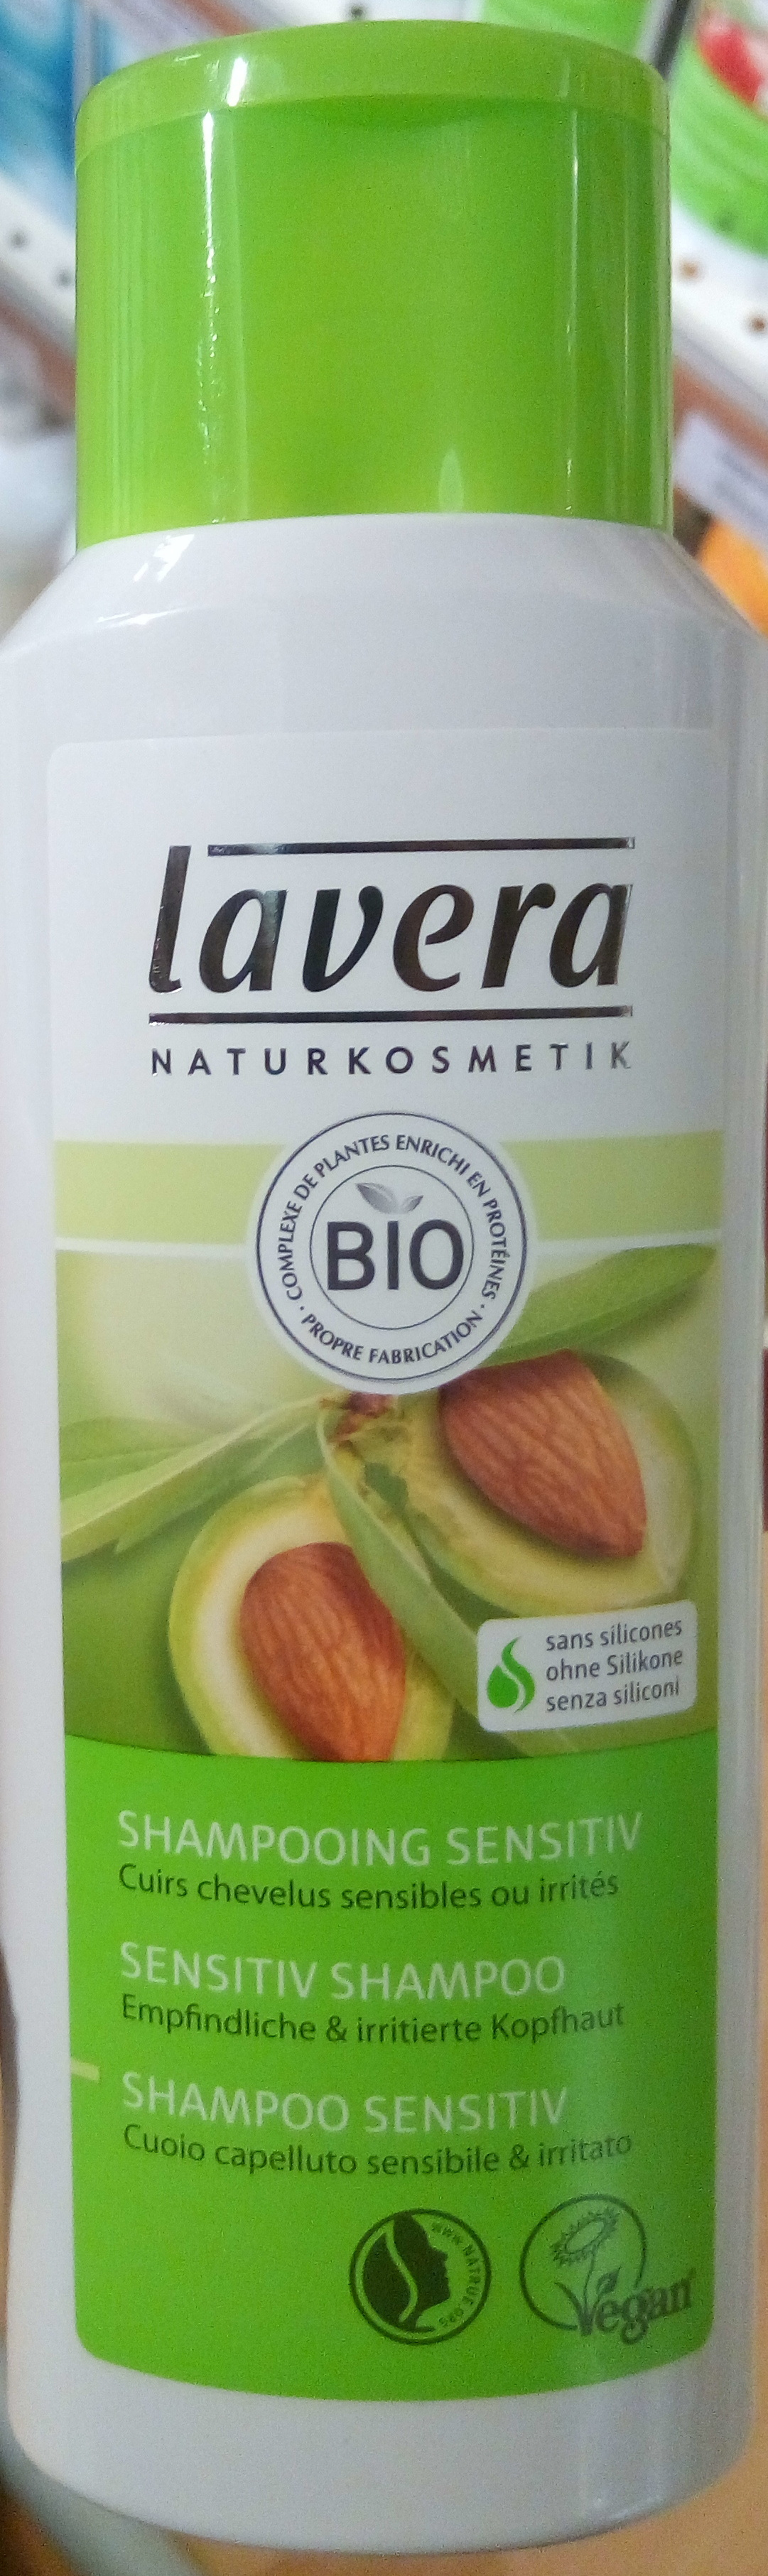 Shampooing Sensitiv - Product - fr